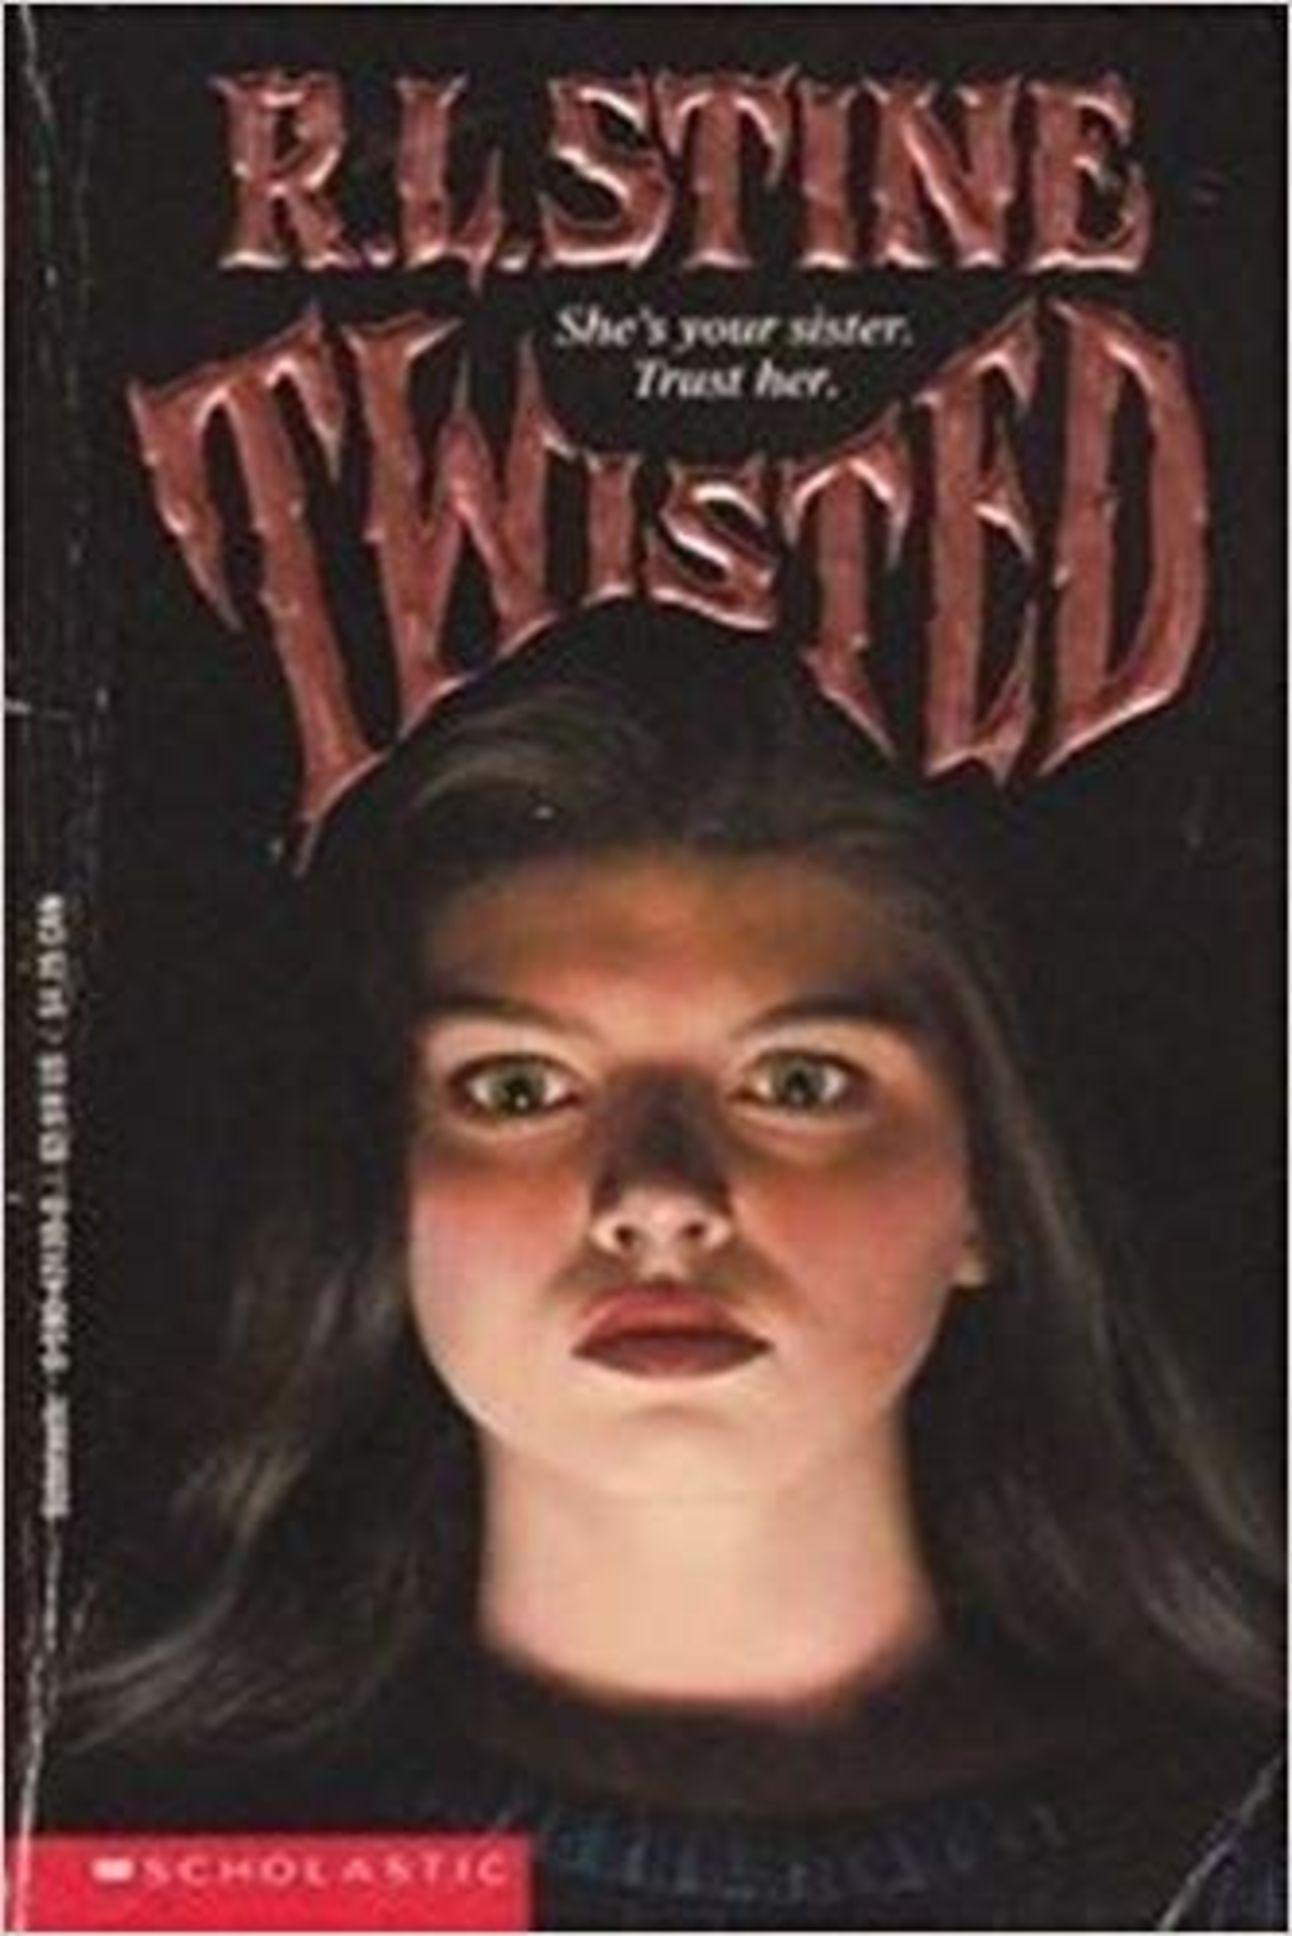 Twisted RL Stine